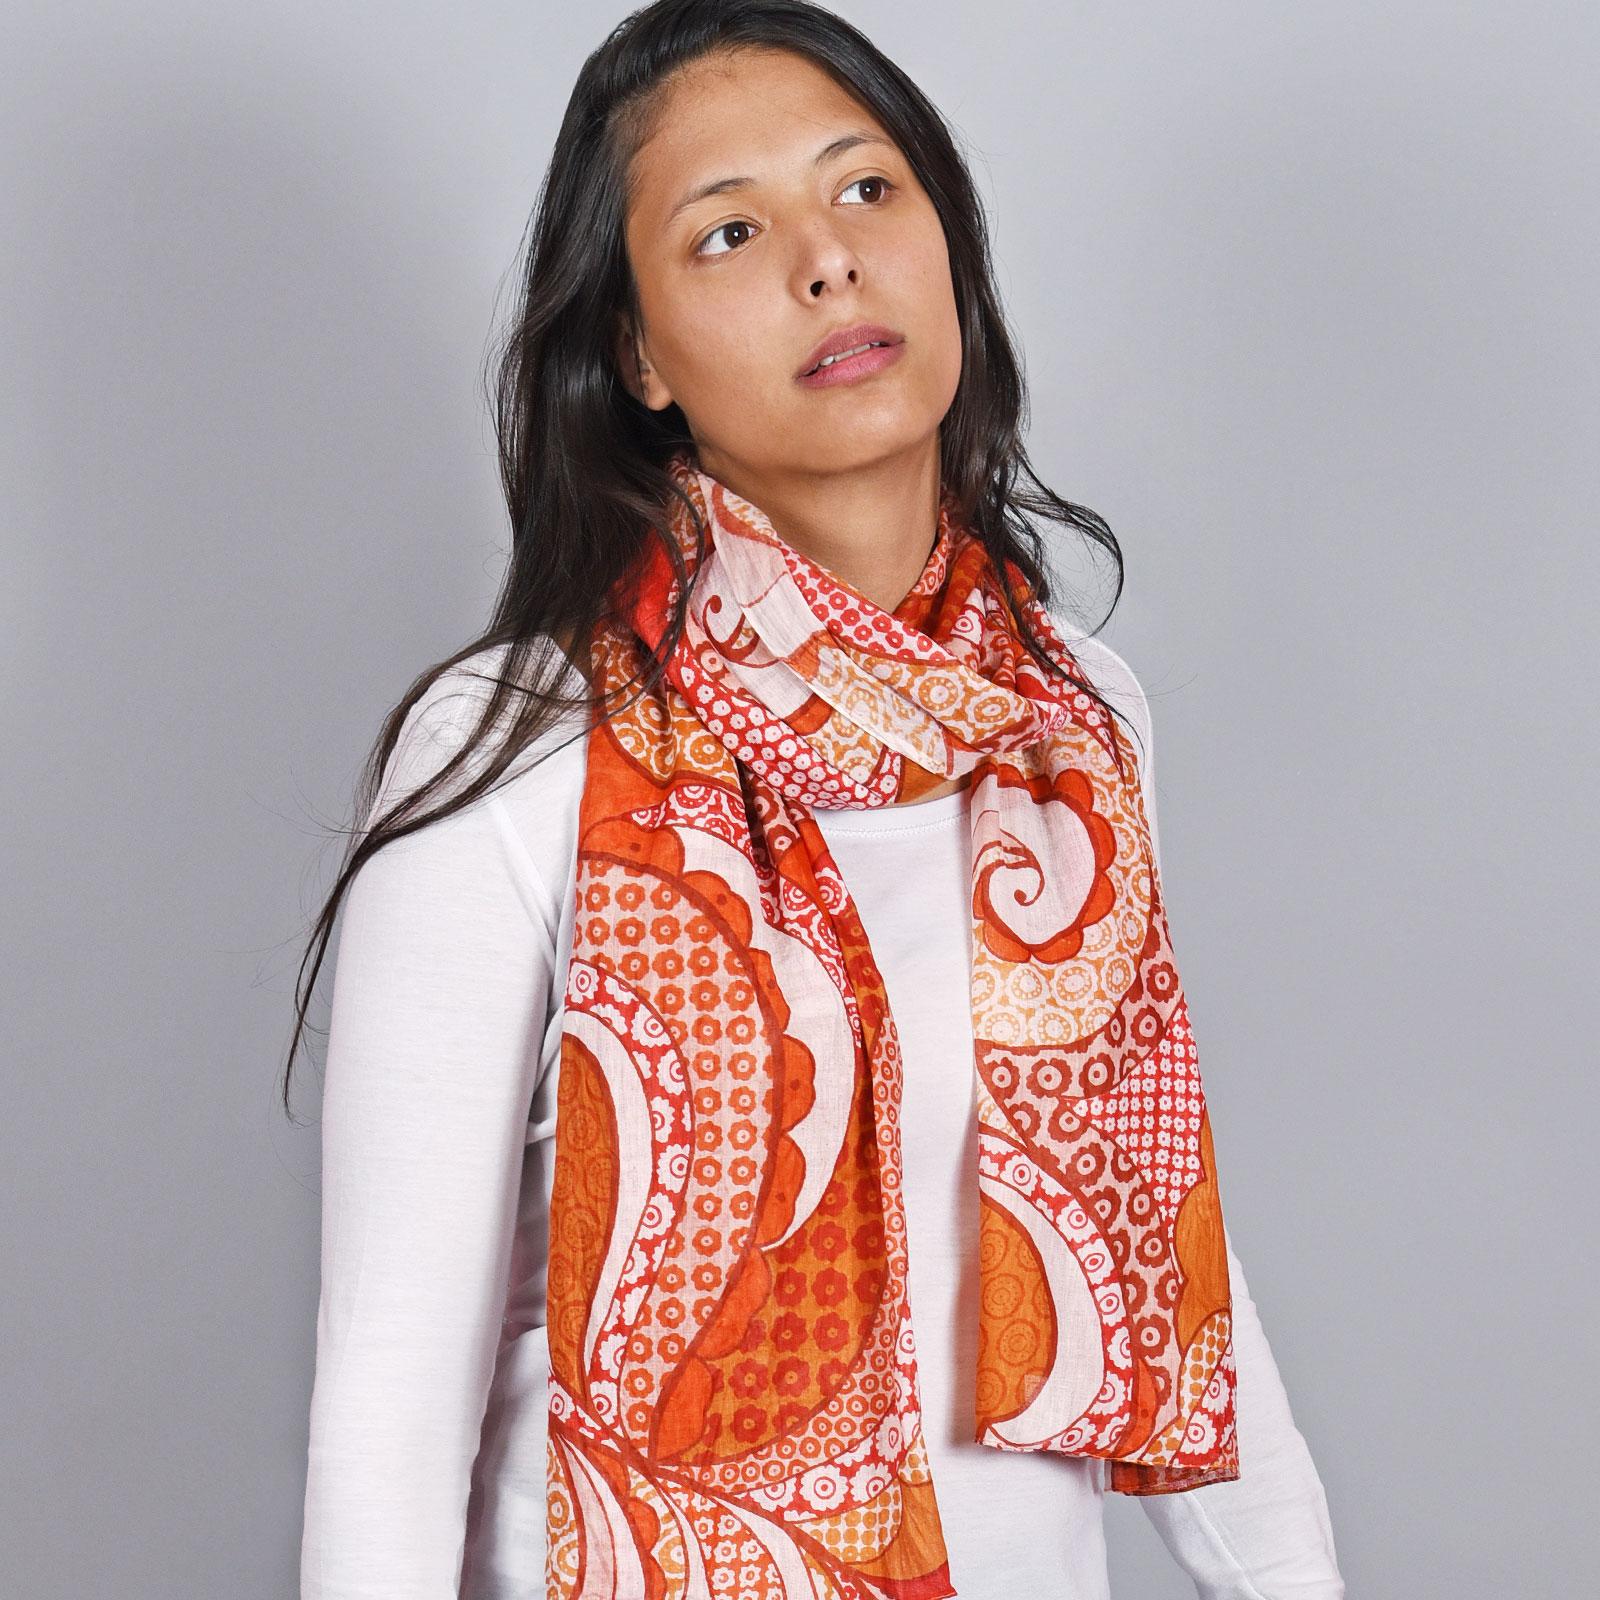 AT-01837-VF16-1-foulard-cheche-coton-orange-rouge